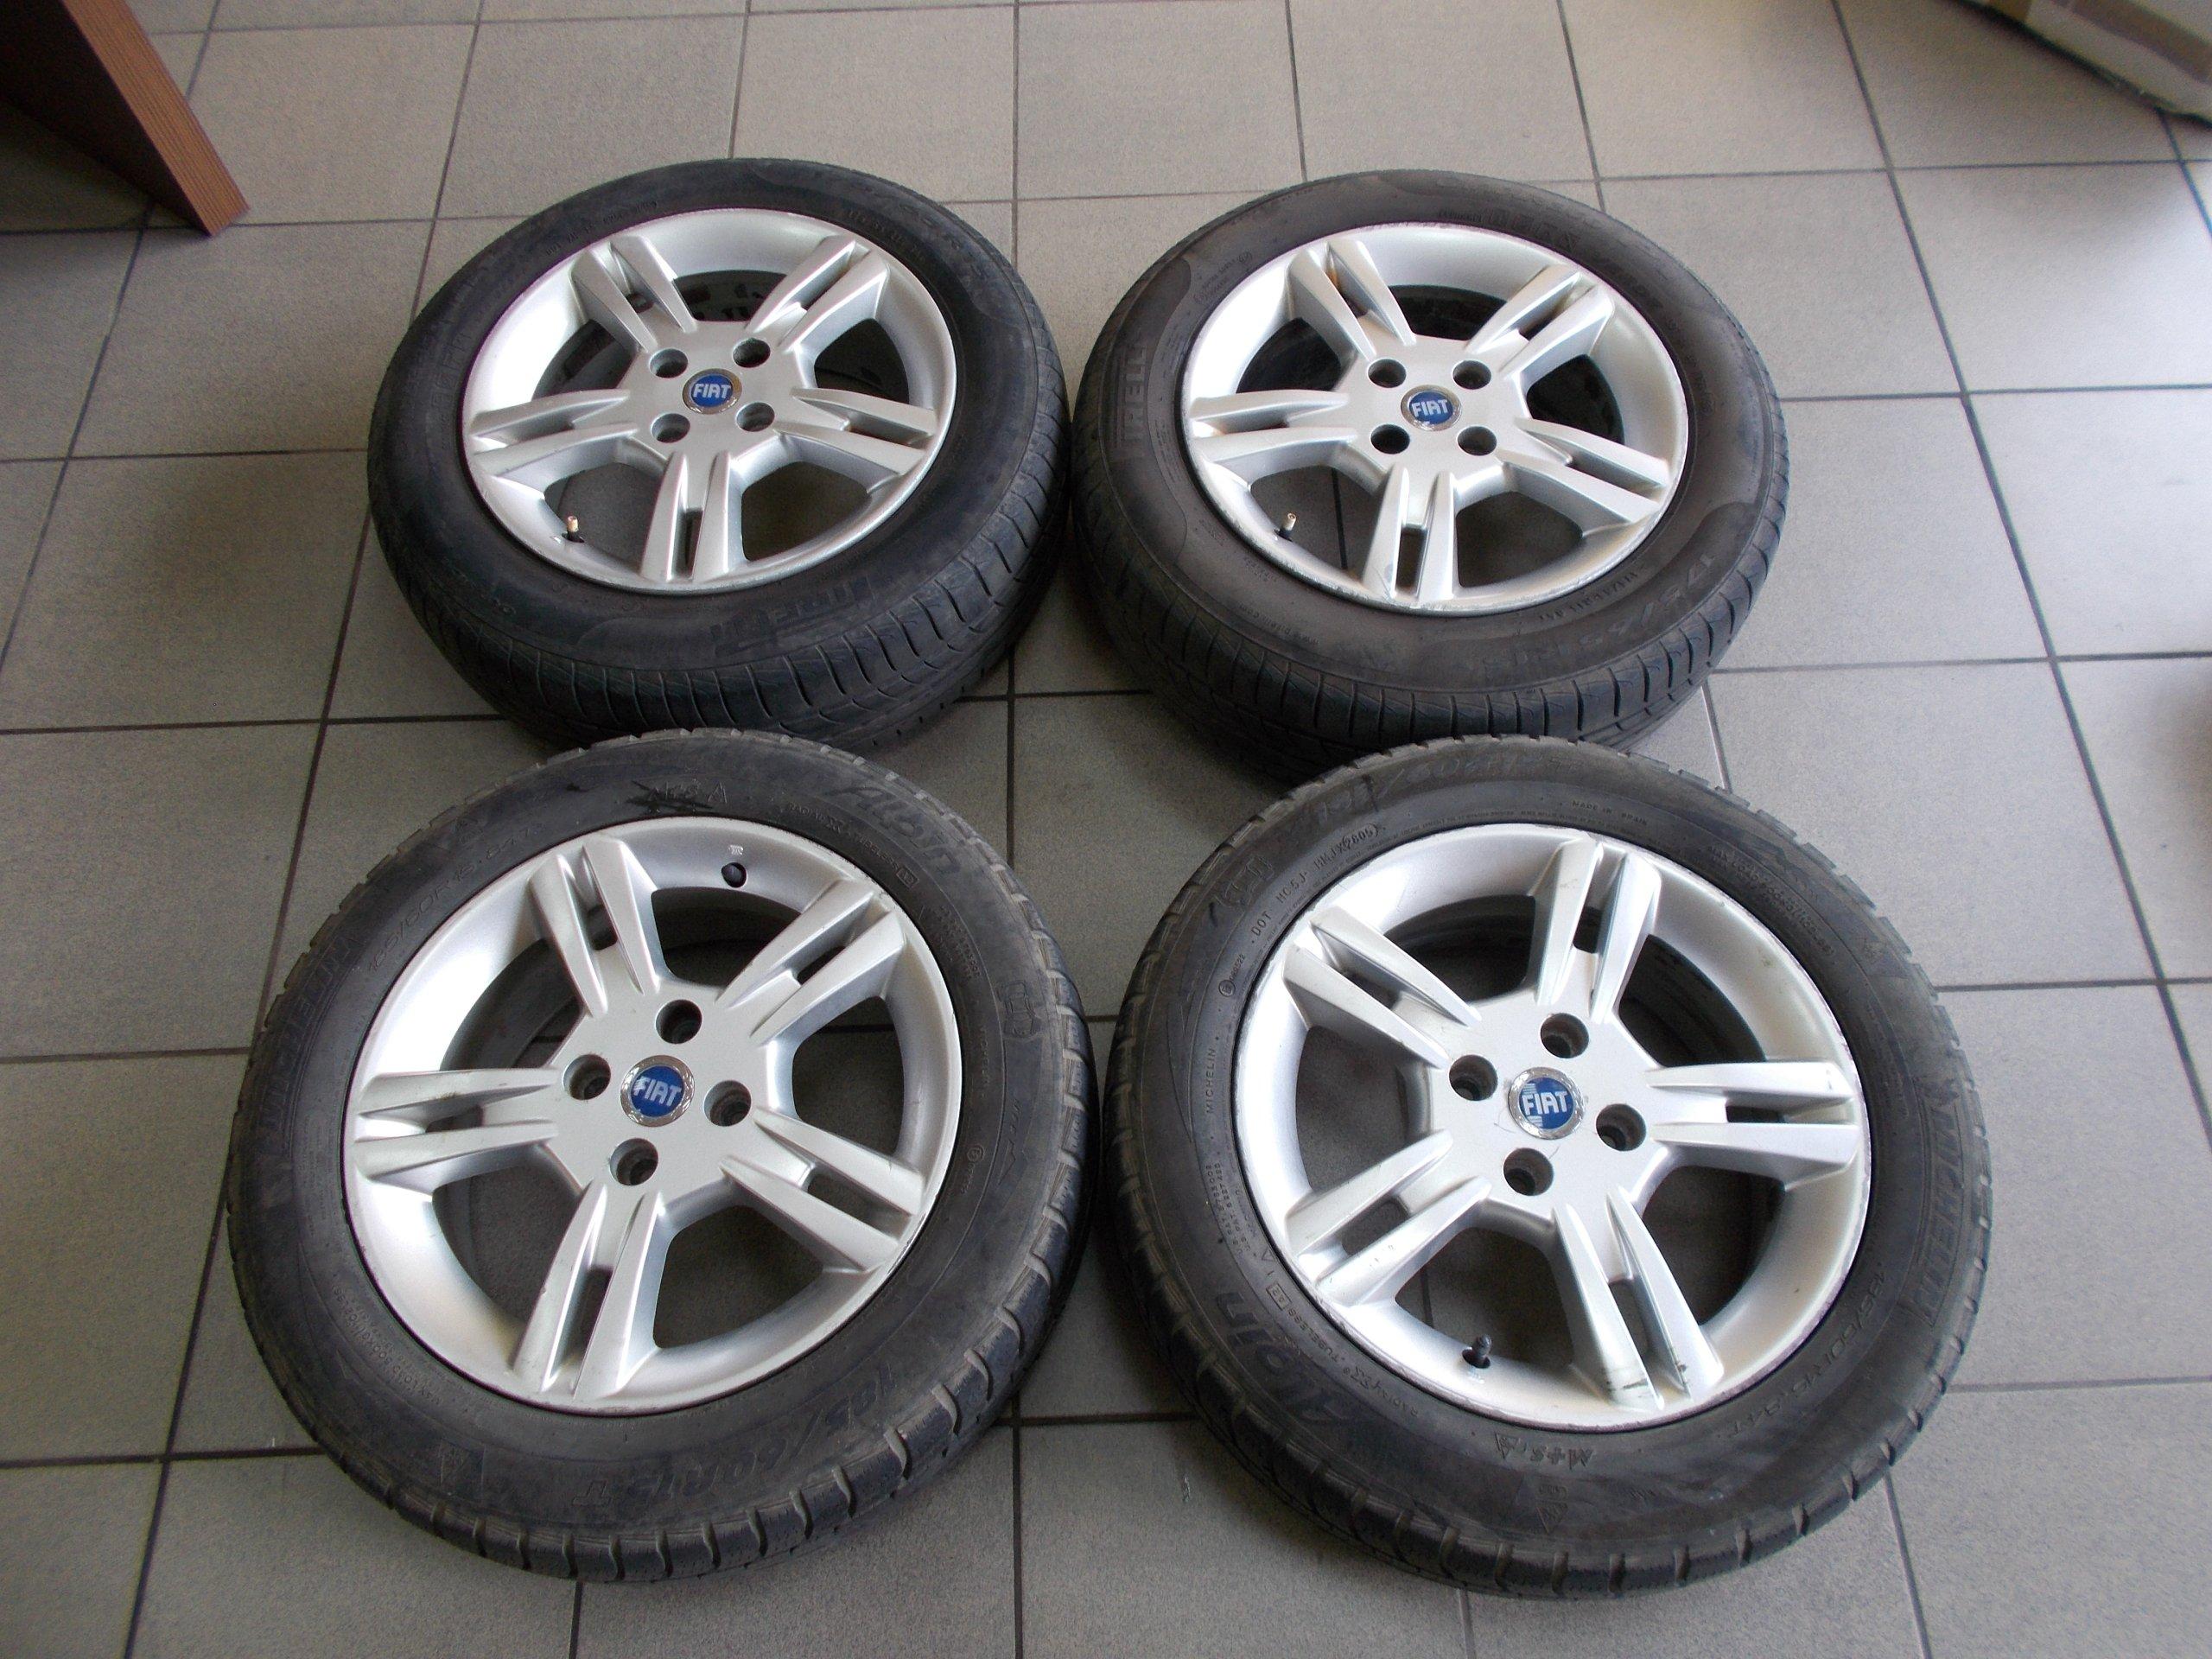 Fiat Grande Punto Felgi Aluminiowe Alufelgi Et43 7308101225